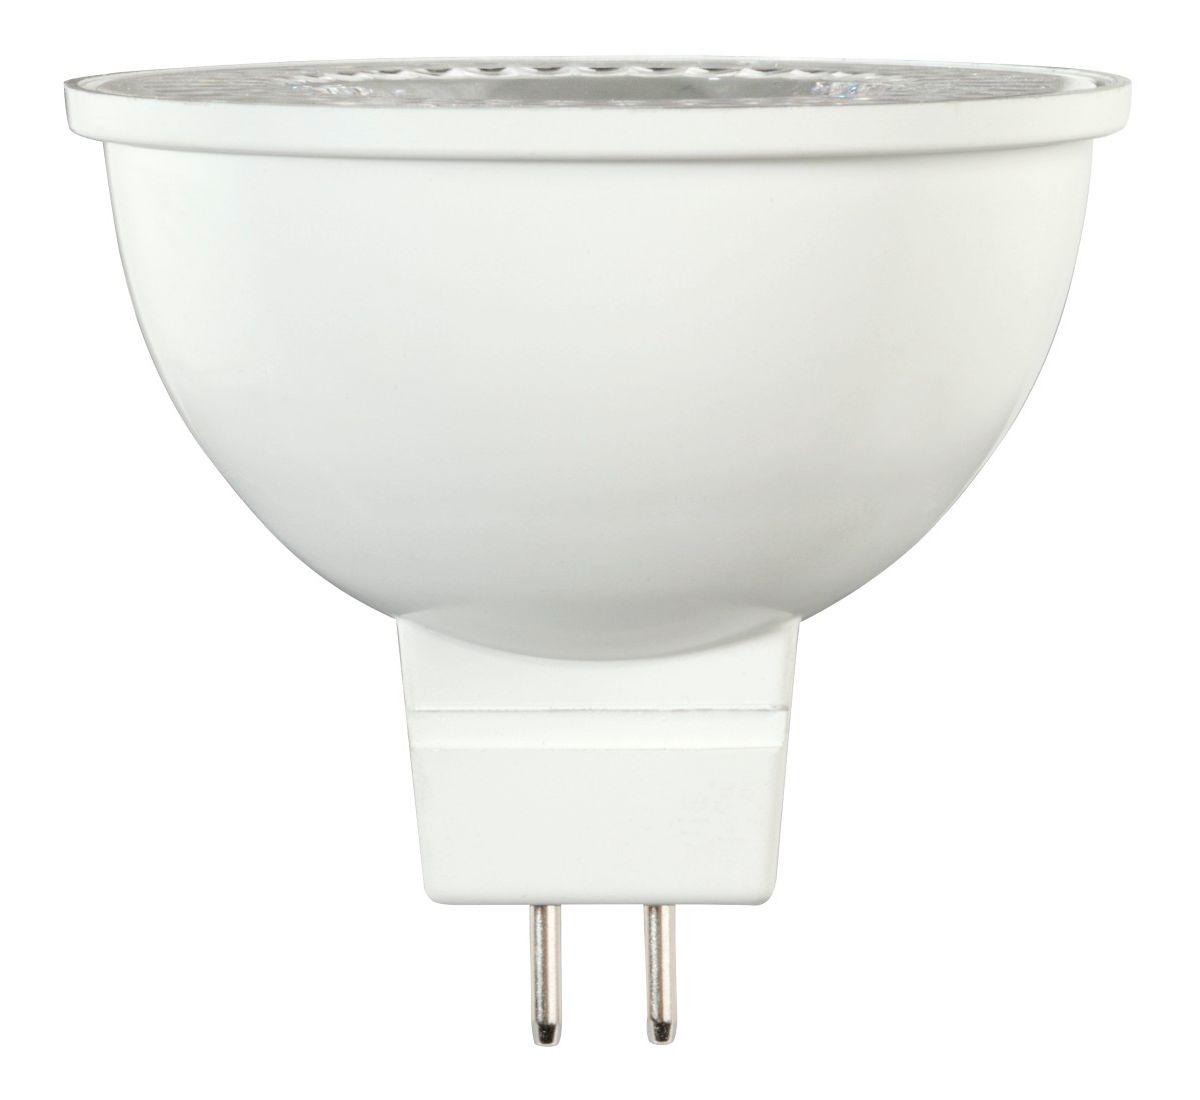 Xavax LED-Lampe, GU5.3, 345lm ersetzt 35W, Refl...